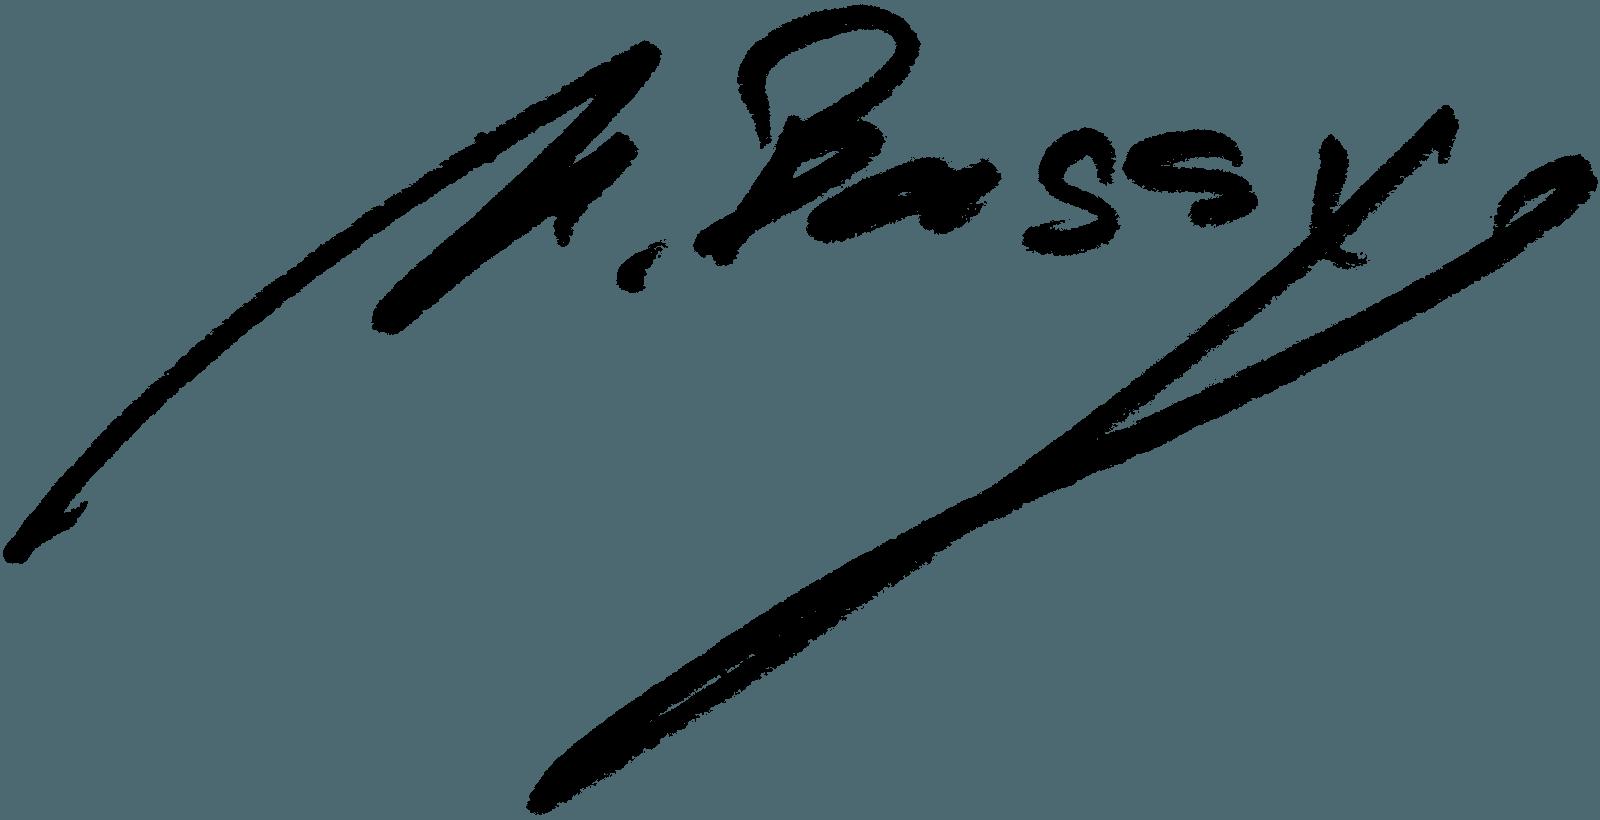 M.Bassy